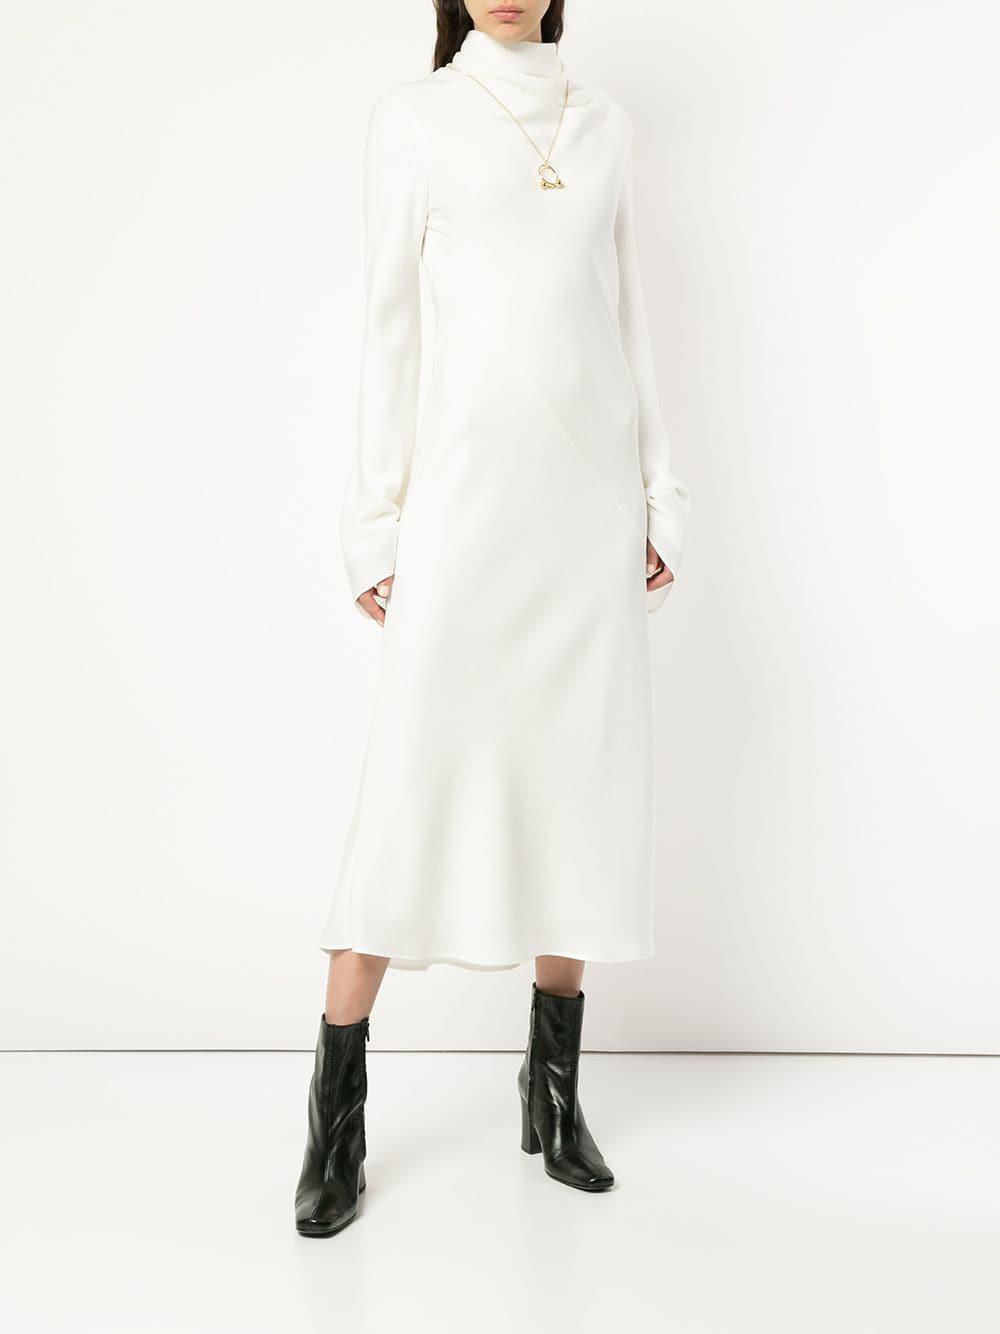 Ellery White Gotham Long Dress Lyst View Fullscreen